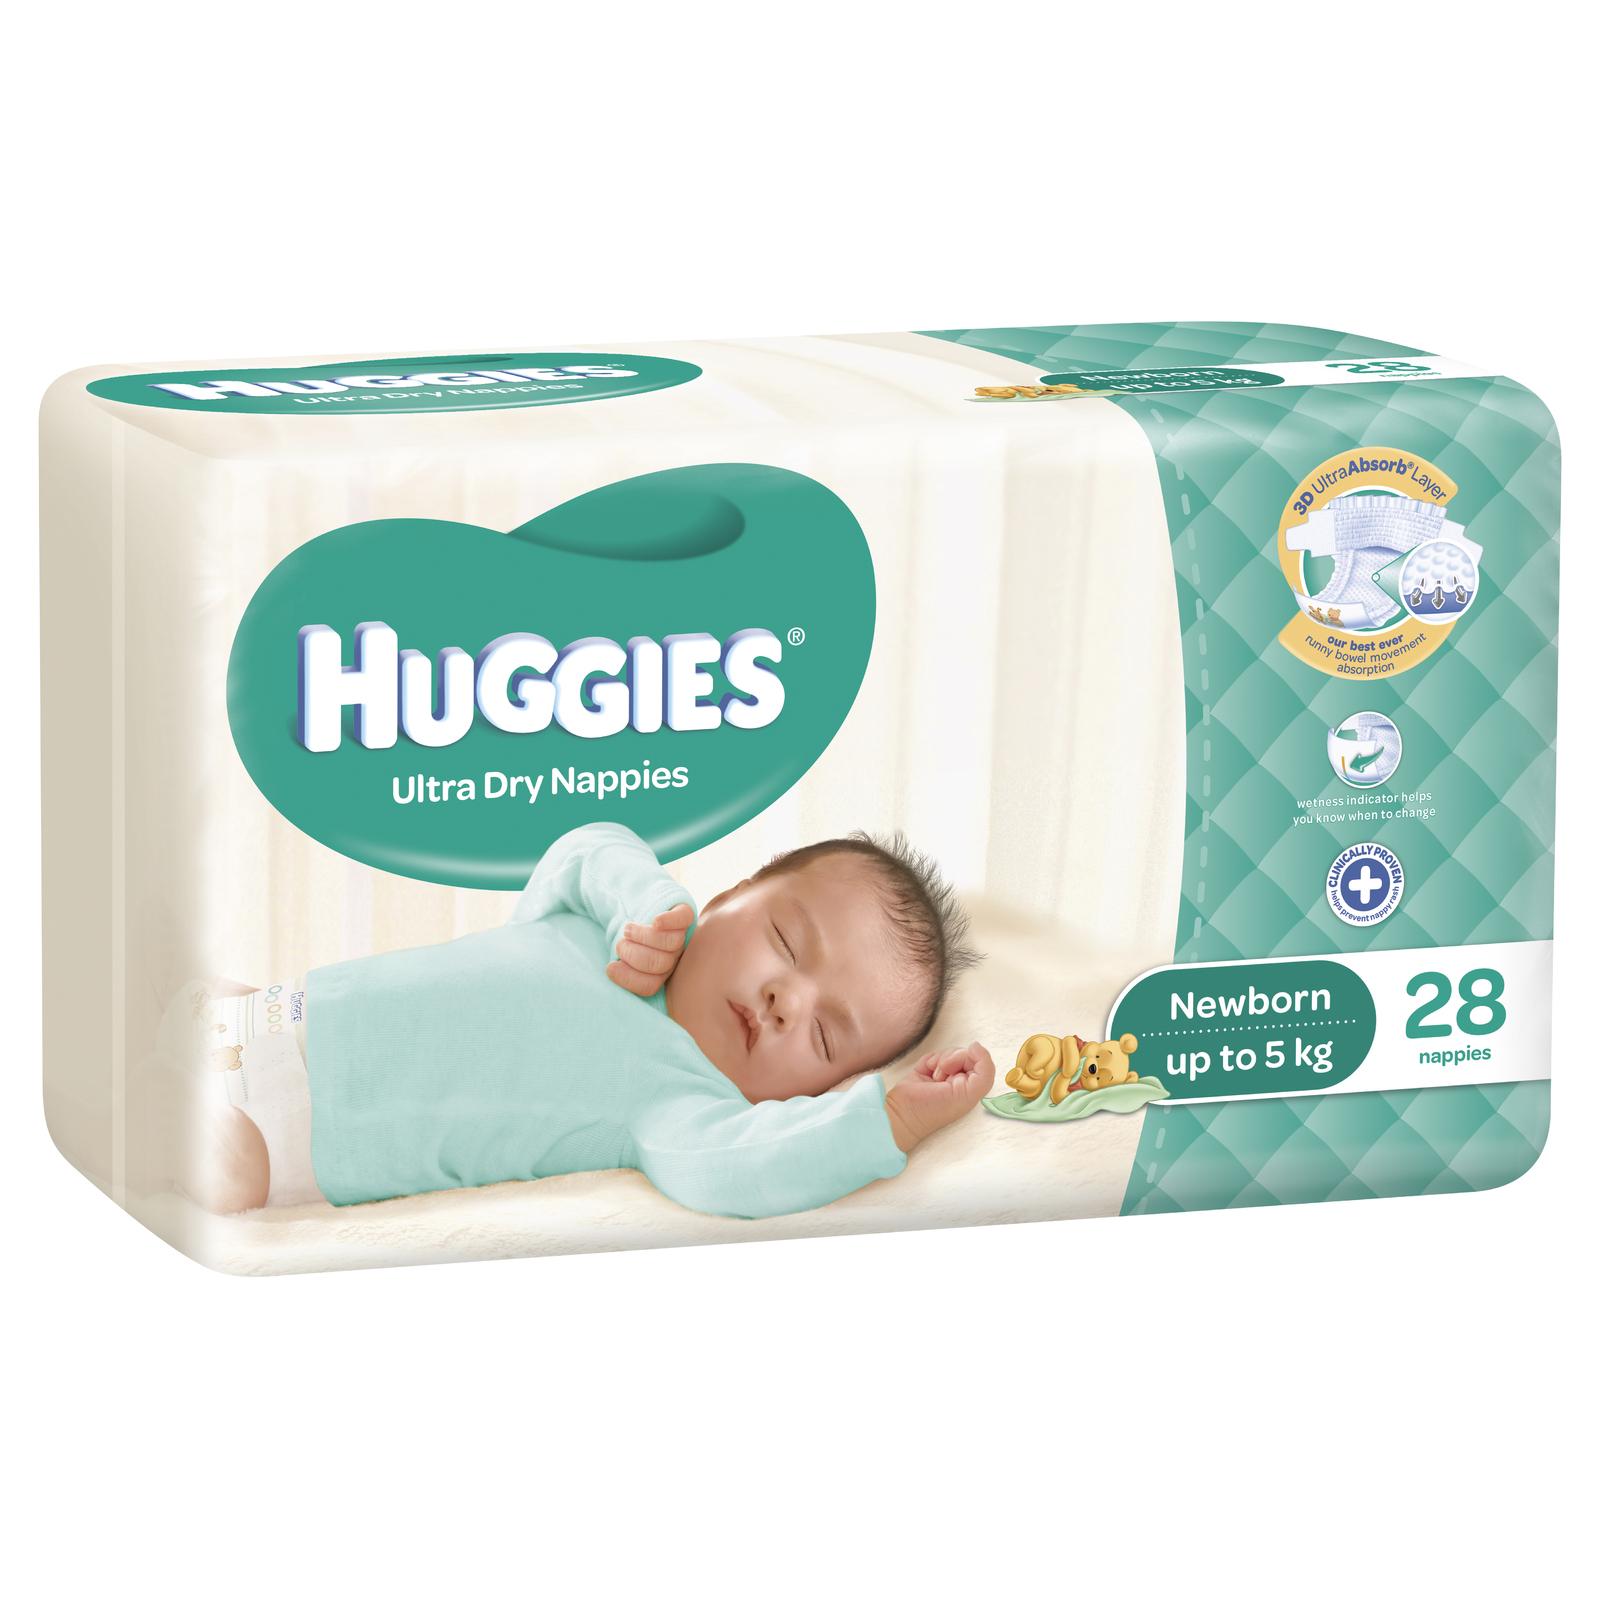 buy huggies ultra nappies newborn at mighty ape australia